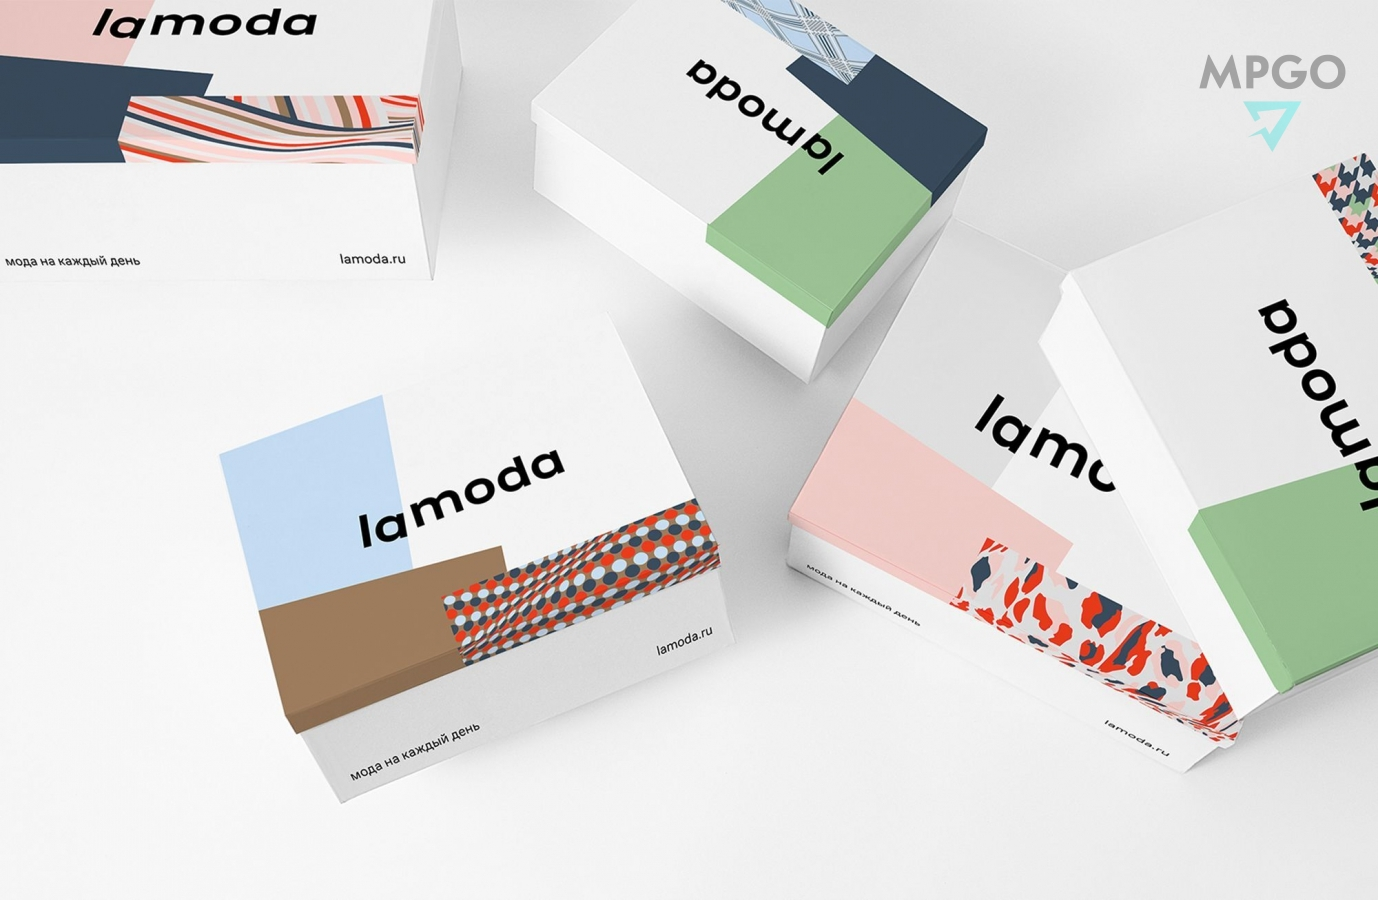 Lamoda курьерская доставка